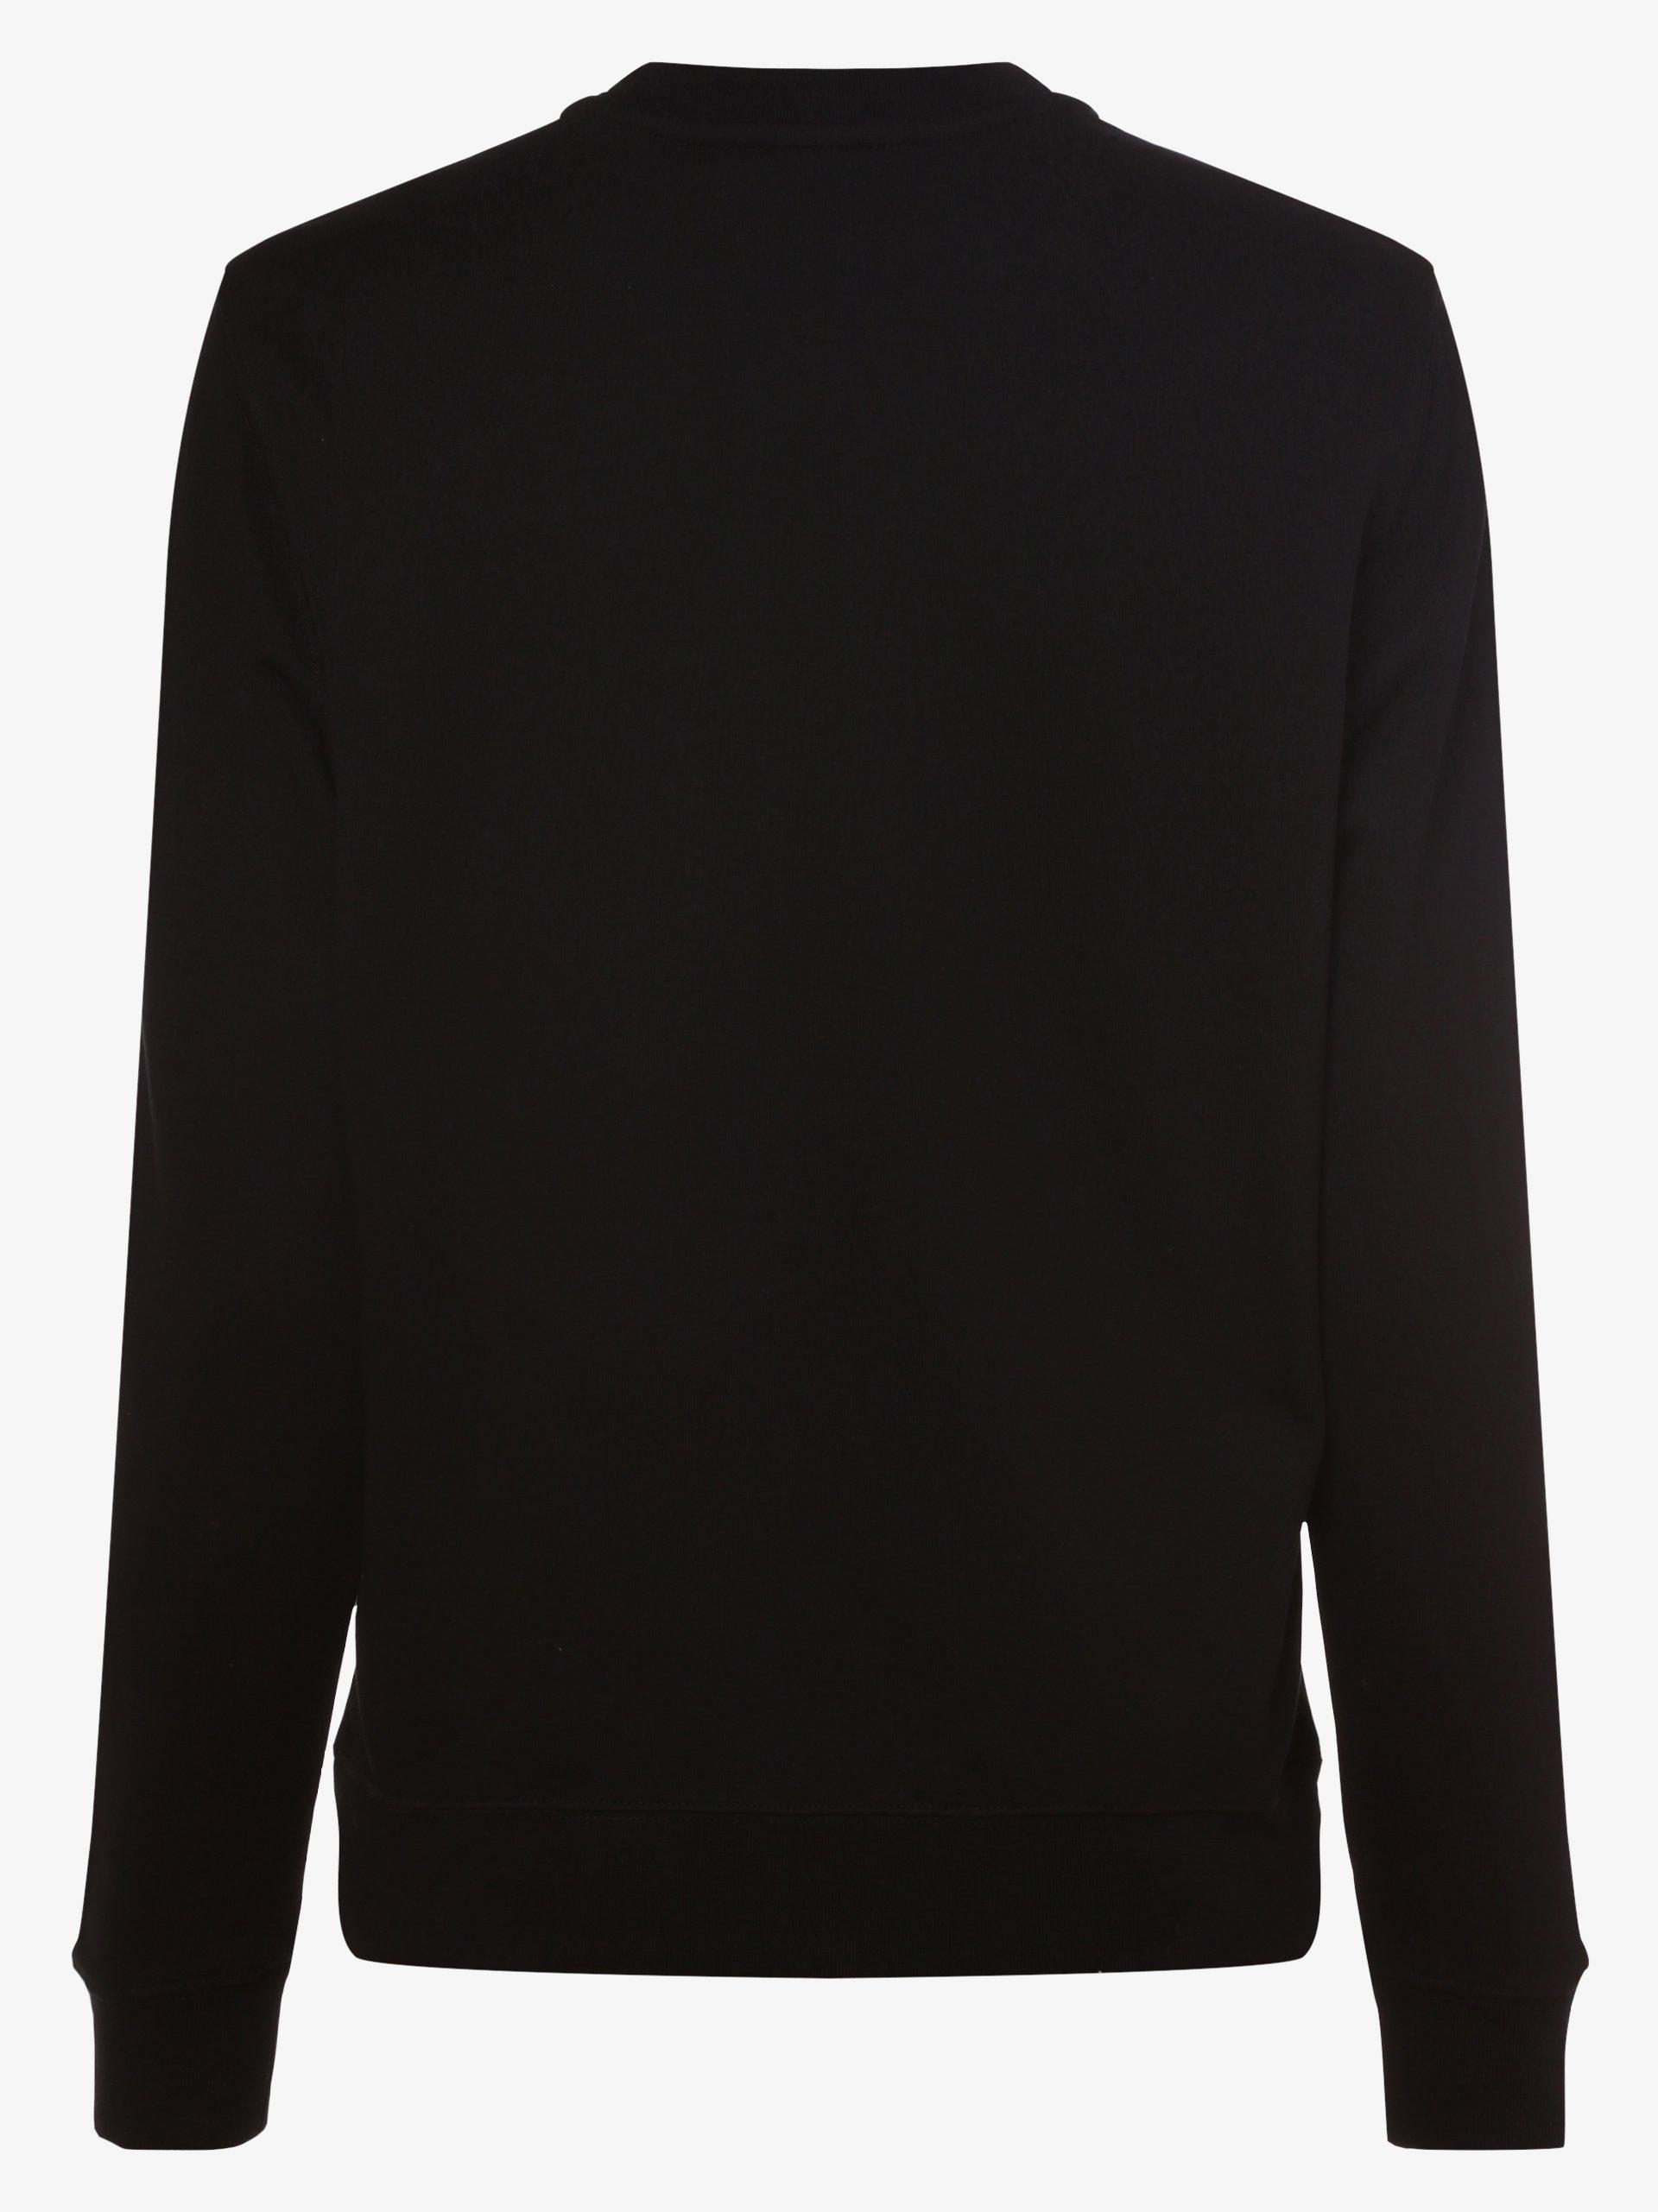 BOSS Casual Damen Sweatshirt - Talaboss